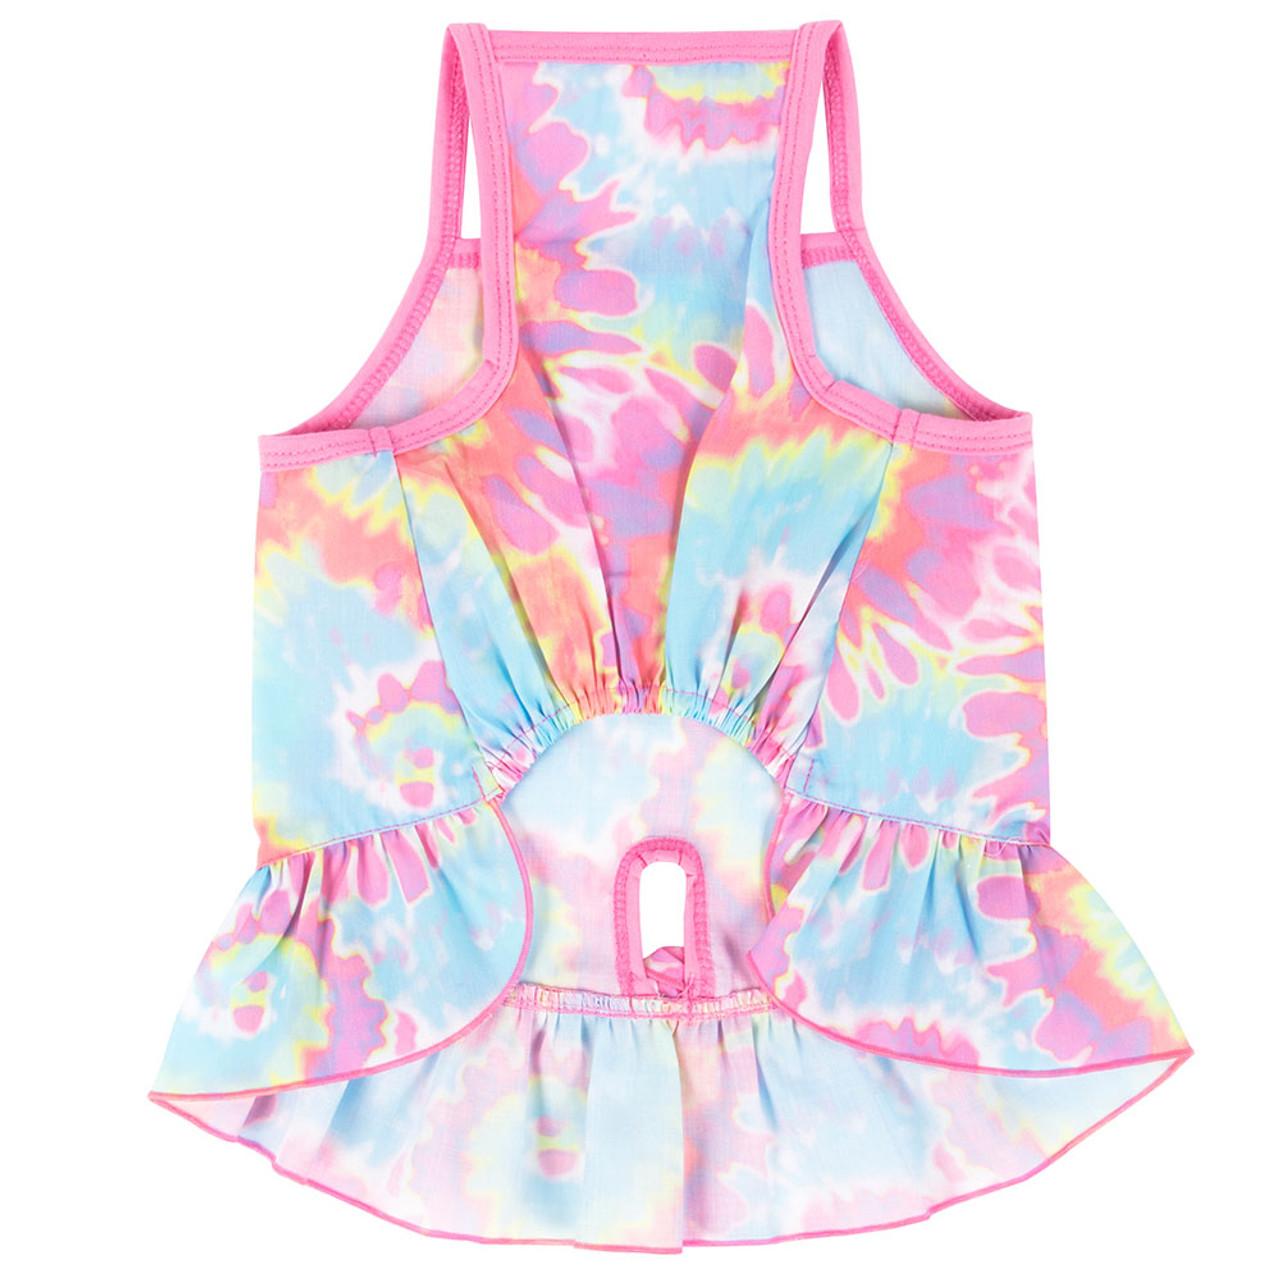 SimplyDog Tie-Dye Dog Dress - Back